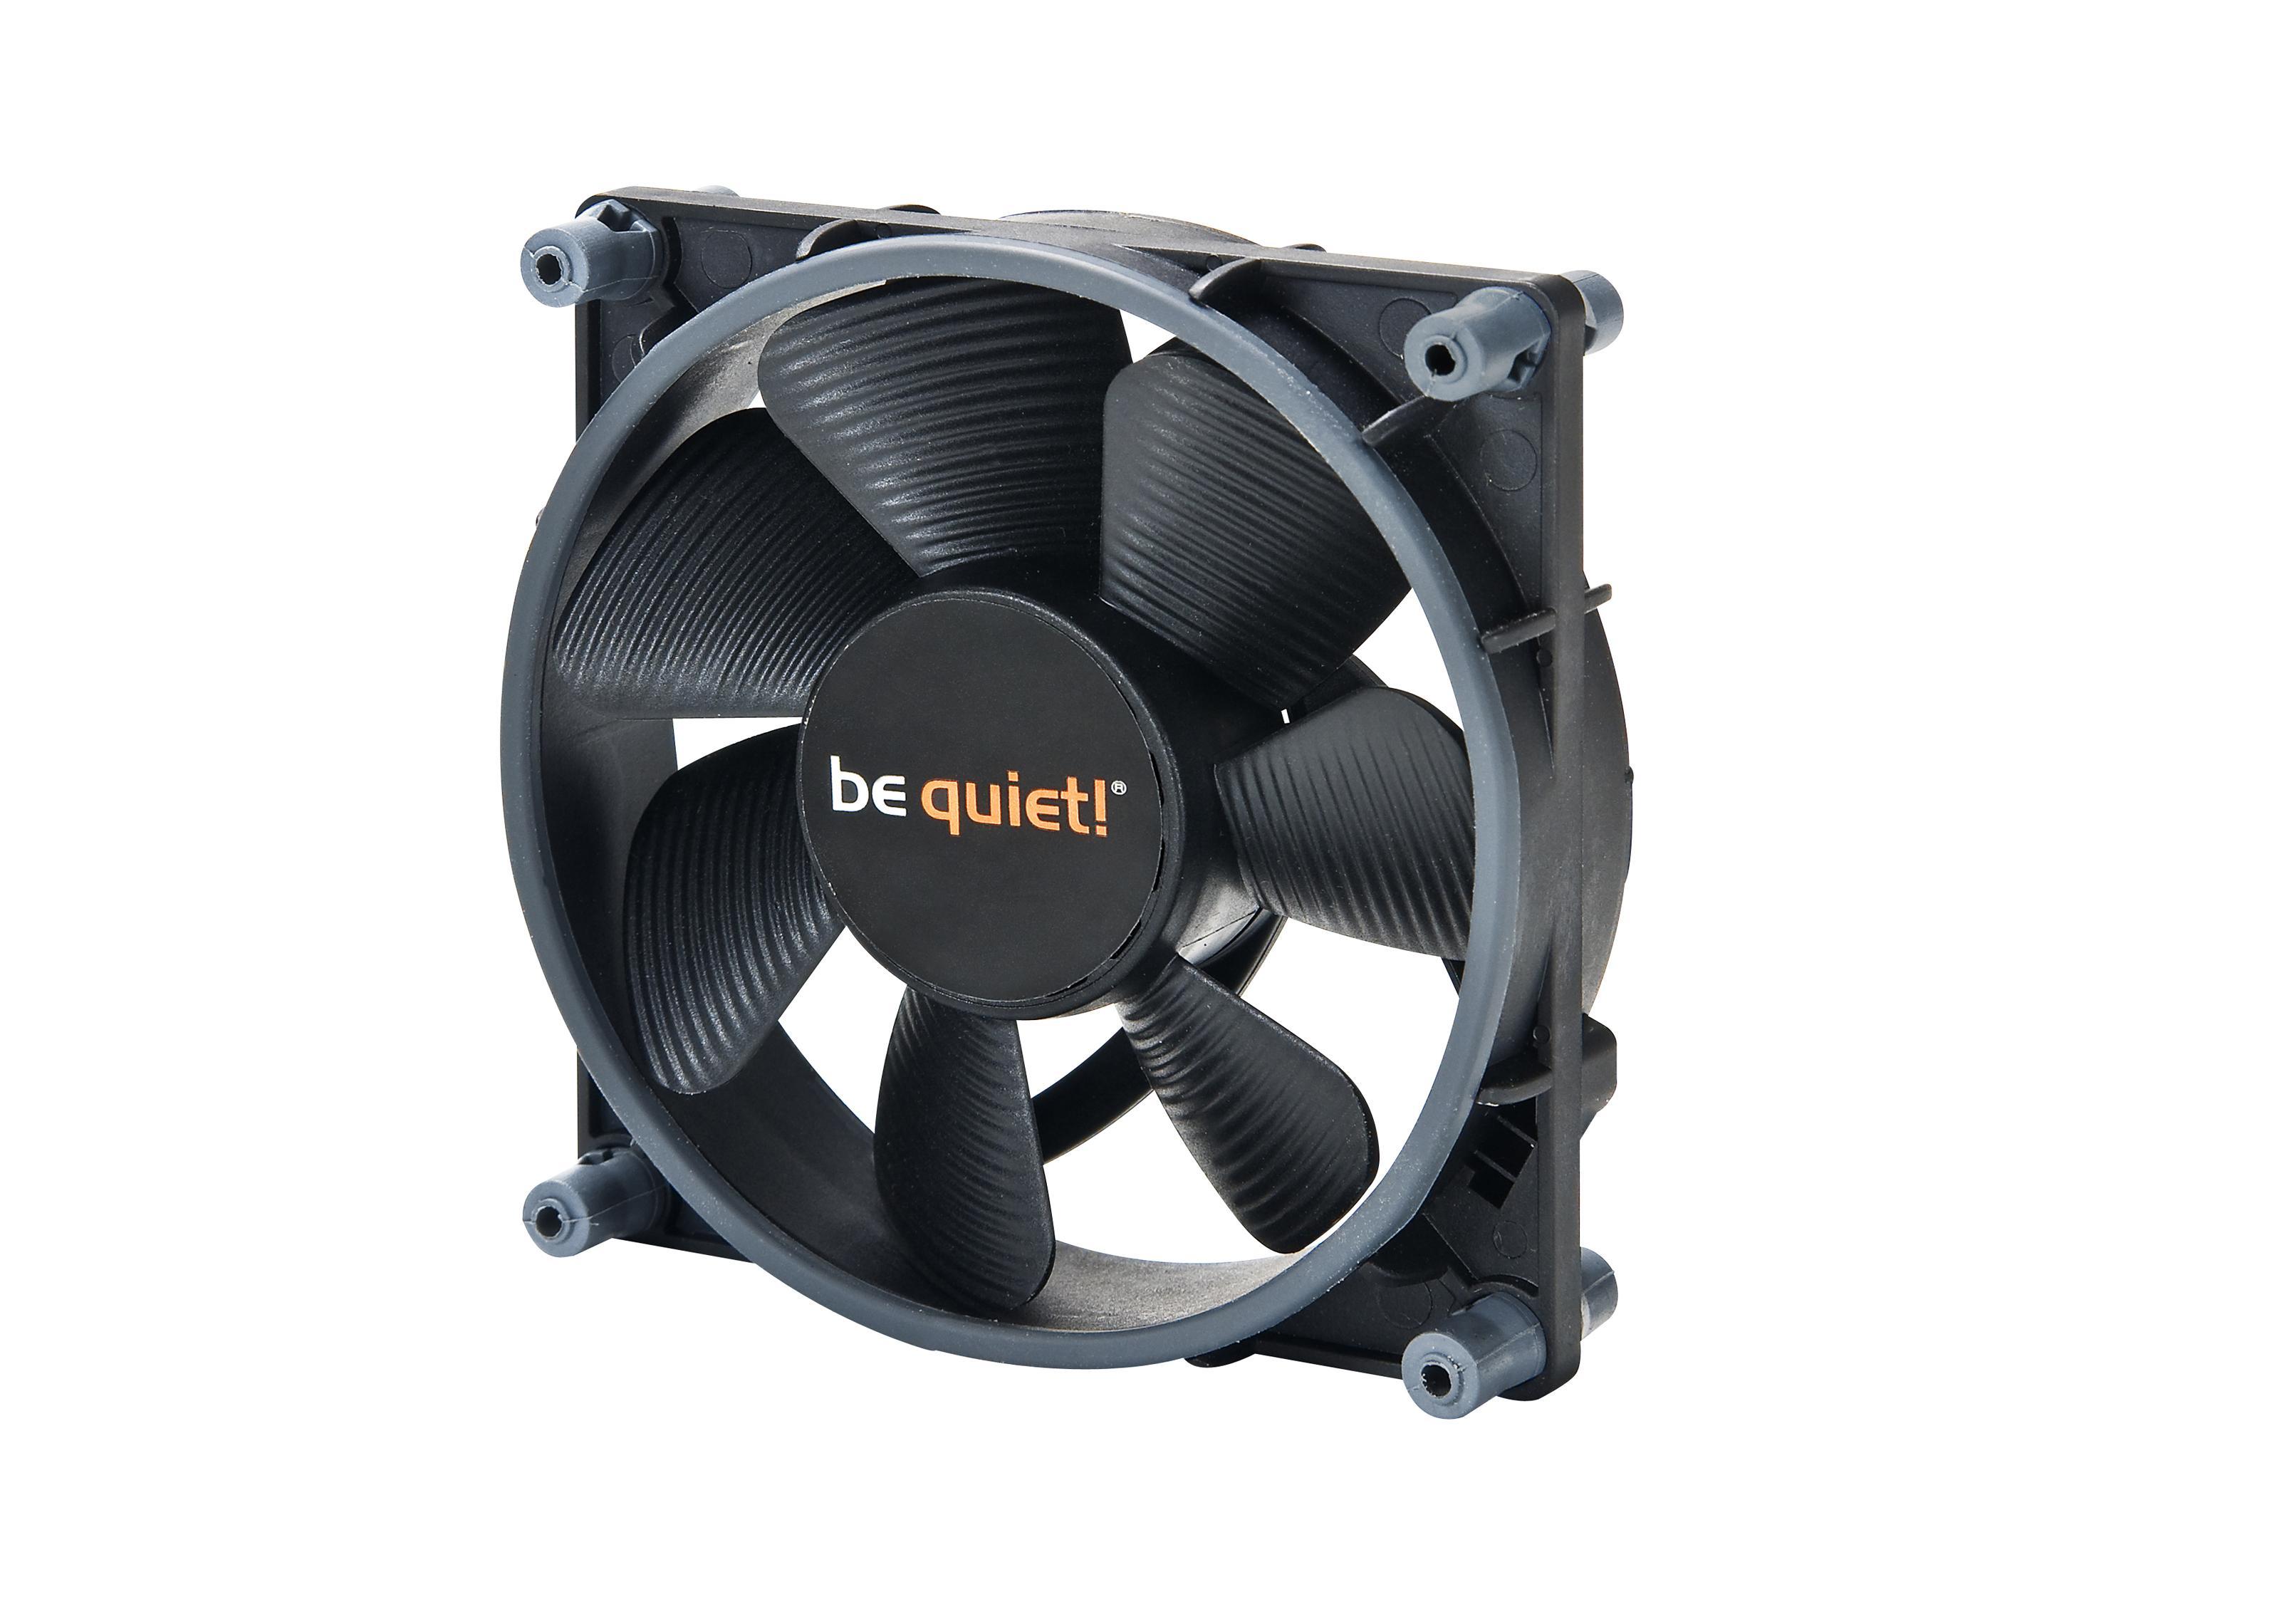 be quiet hardware koeling shadow wings sw1 92mm pwm bl025 kopen online bestellen geen. Black Bedroom Furniture Sets. Home Design Ideas